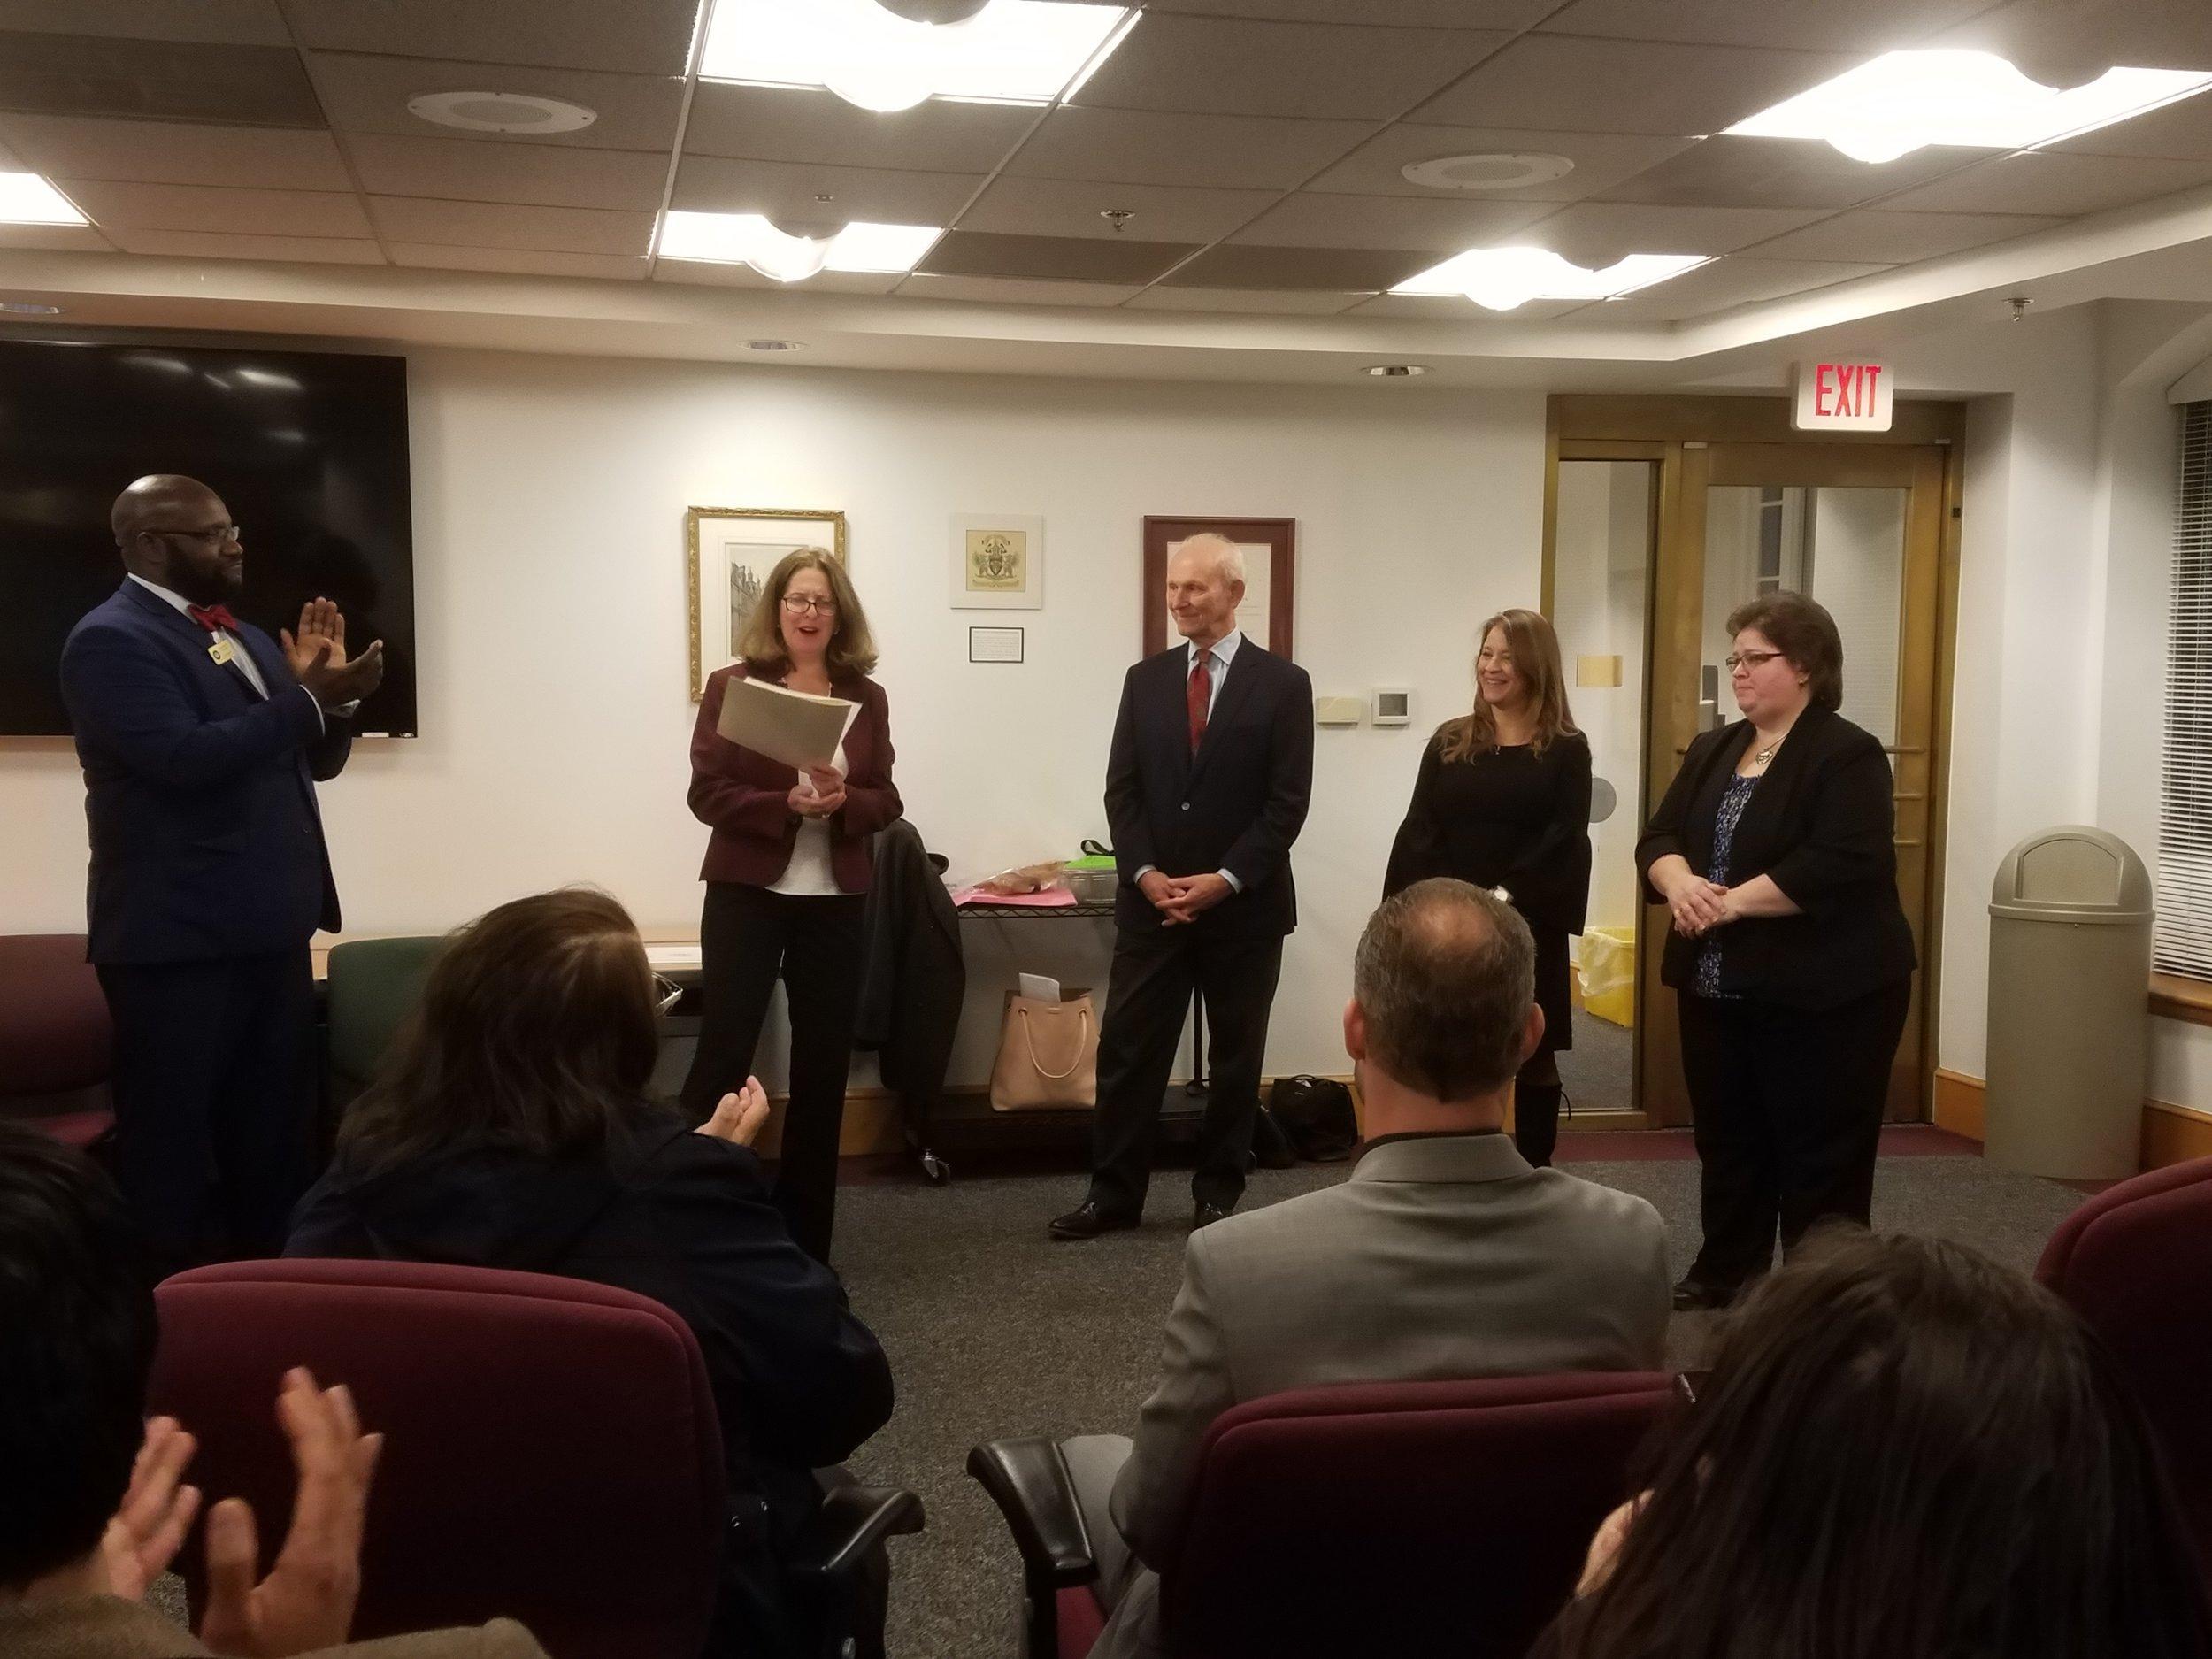 L-R: Councilman John Chapman, Mayor Allison Silberberg, Daniel Abramson, Vanessa Rodriguez, and Stephanie Oliver